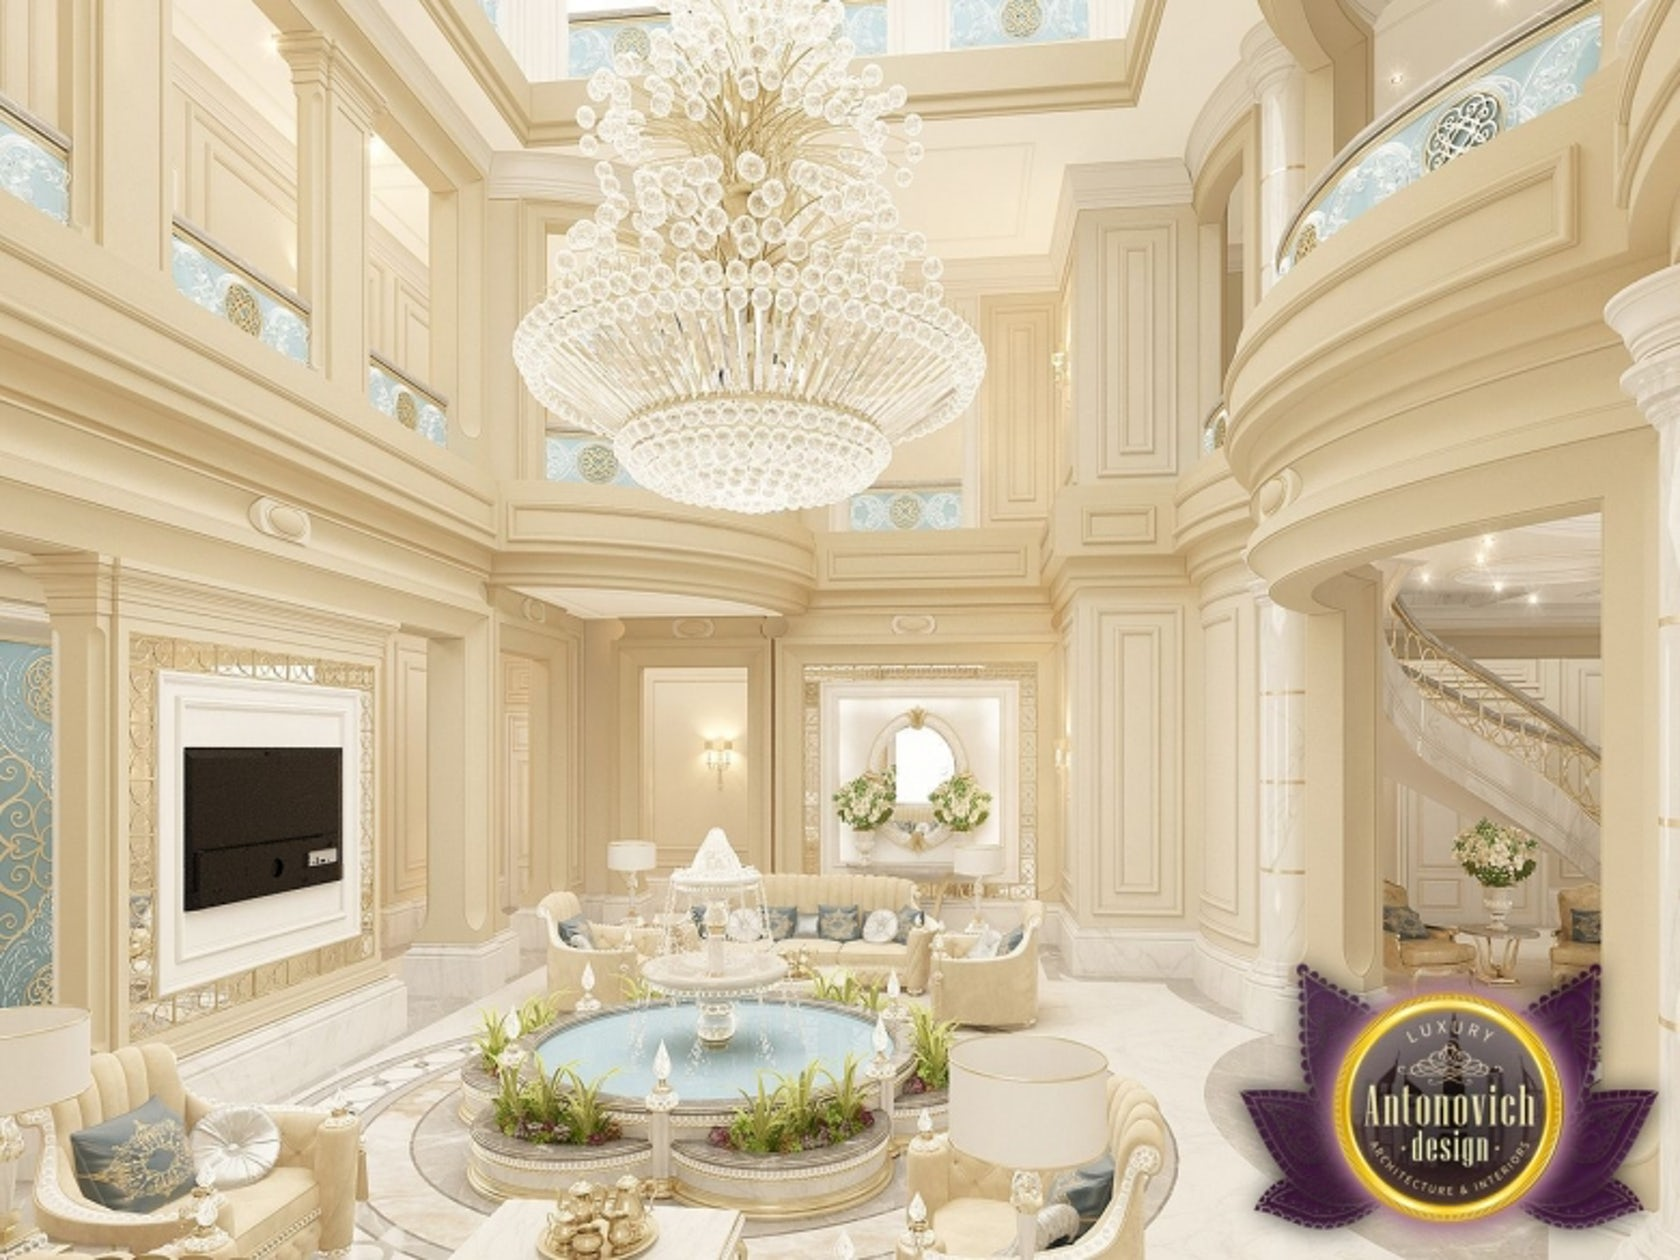 Beautiful House Designs From Luxury Antonovich Design